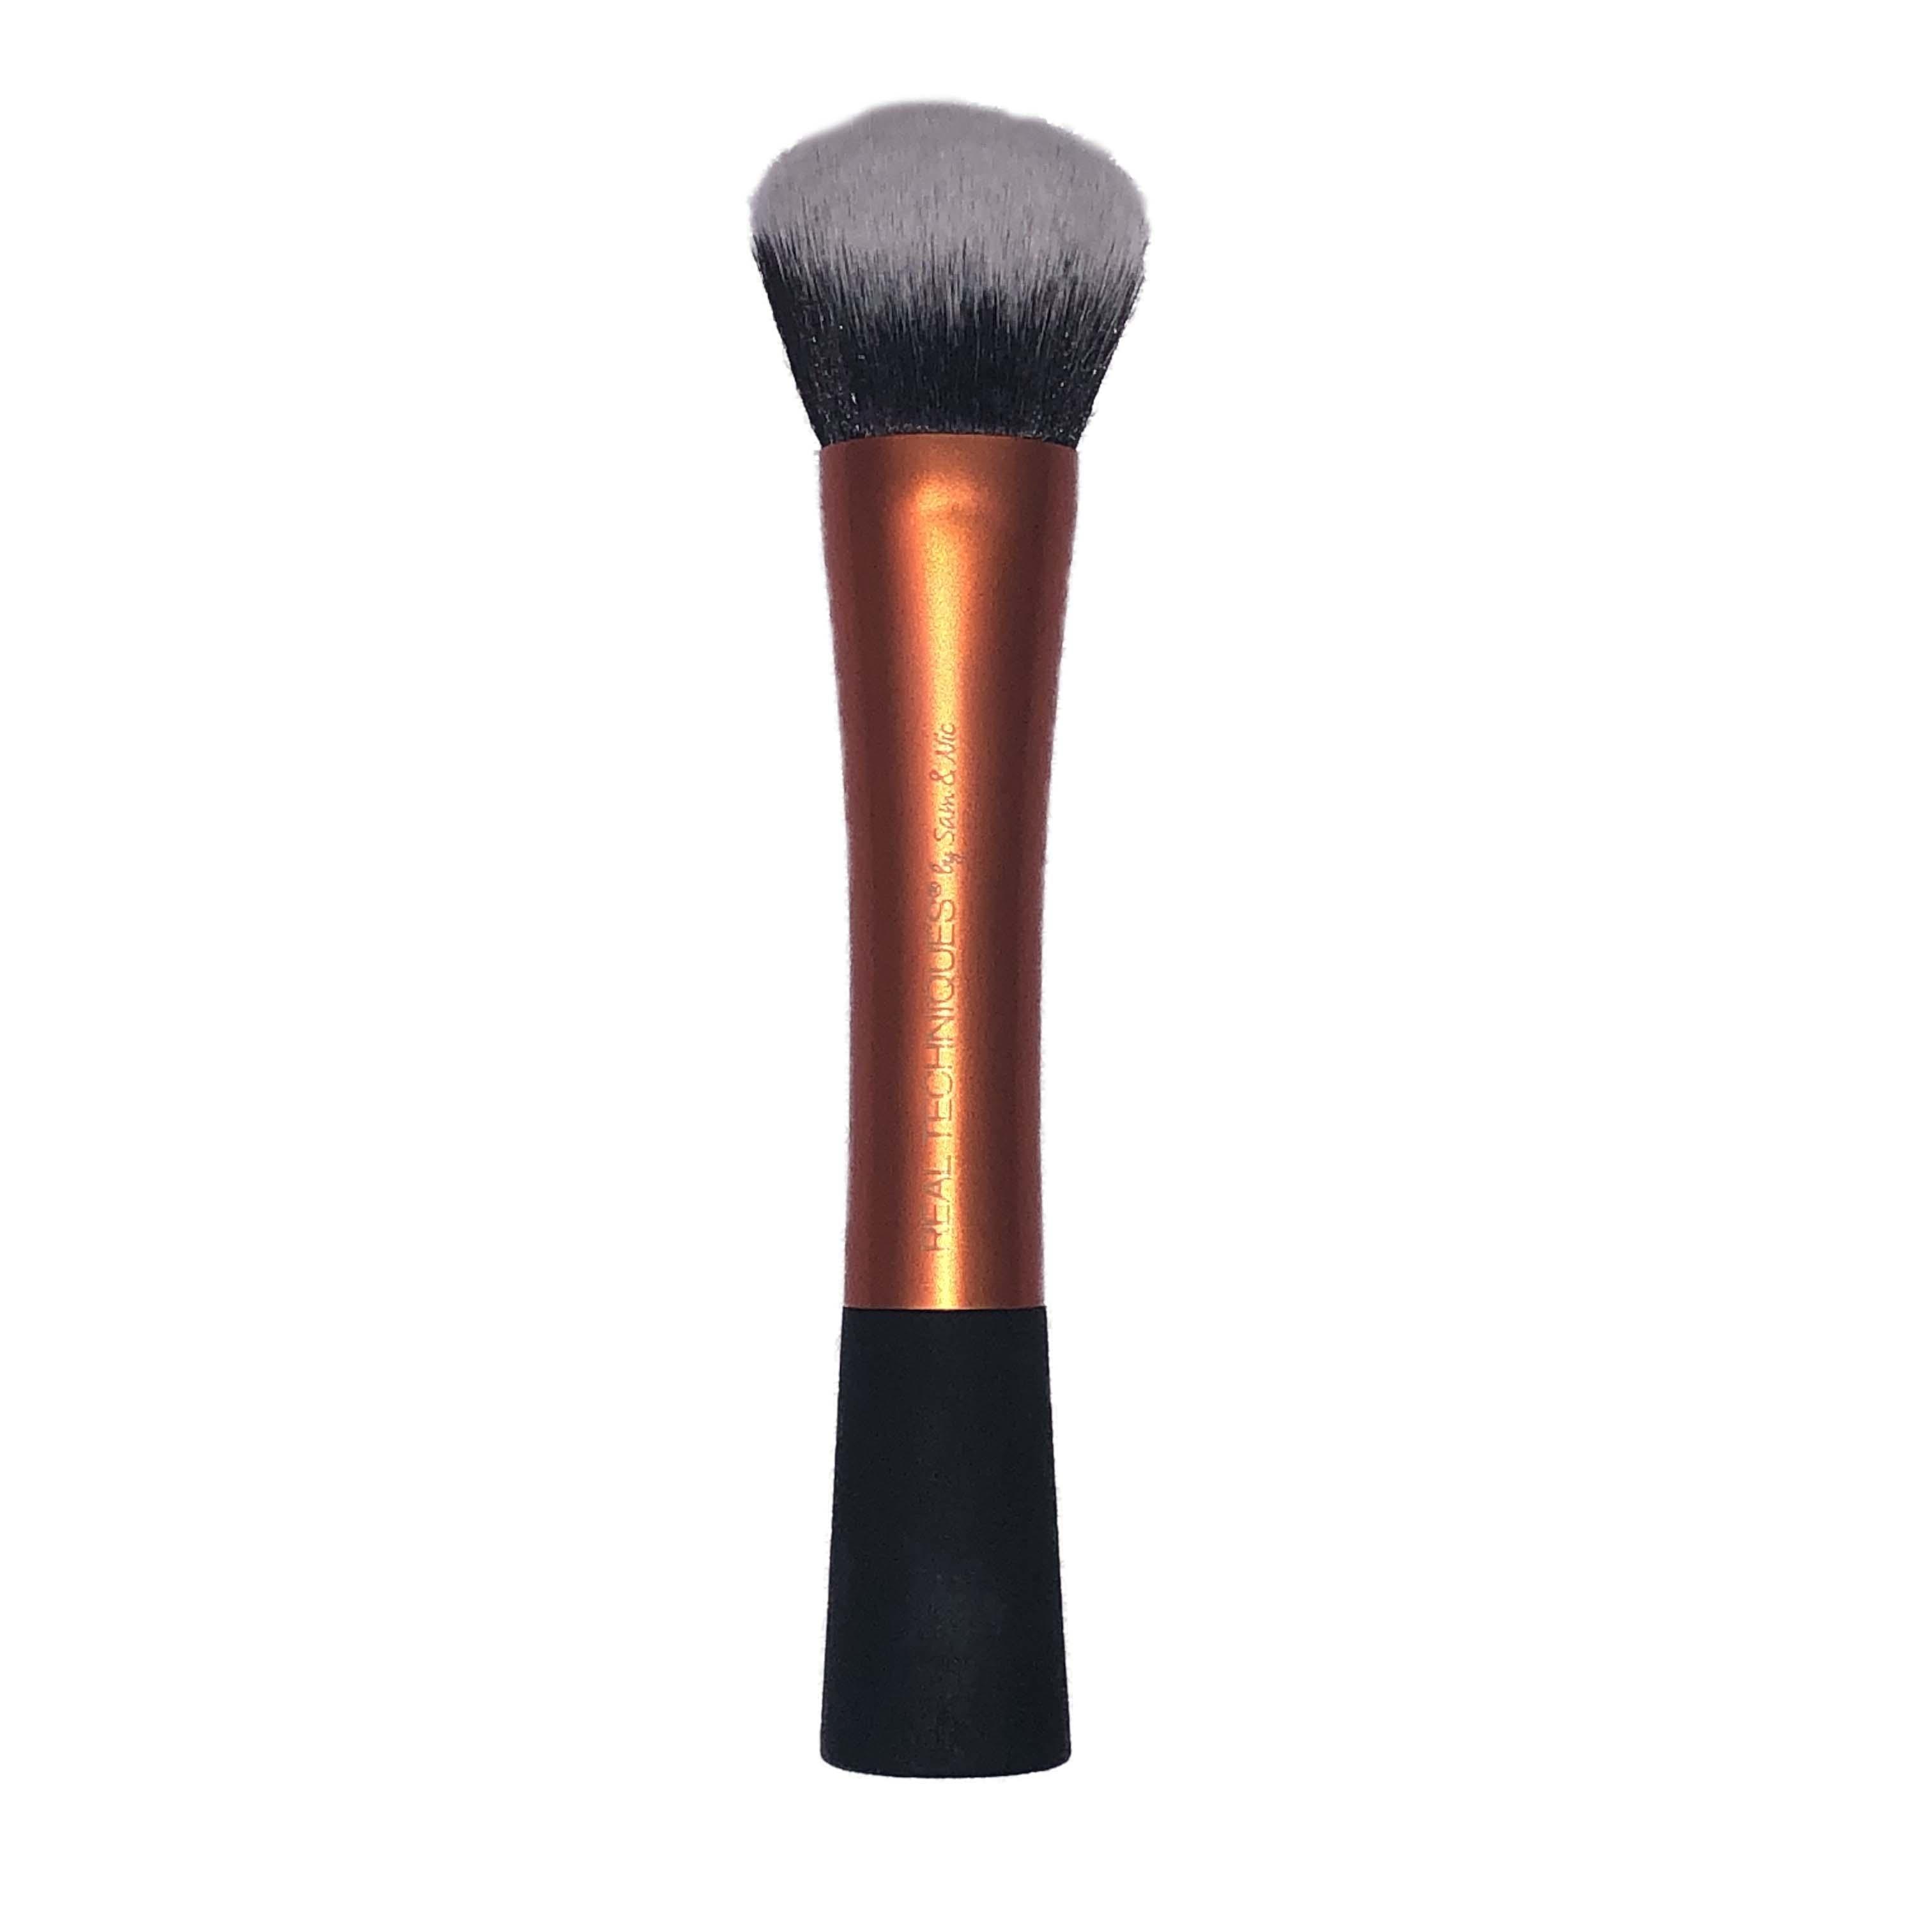 Real Techniques Large Slanted Duo-Fibre Face Brush Orange